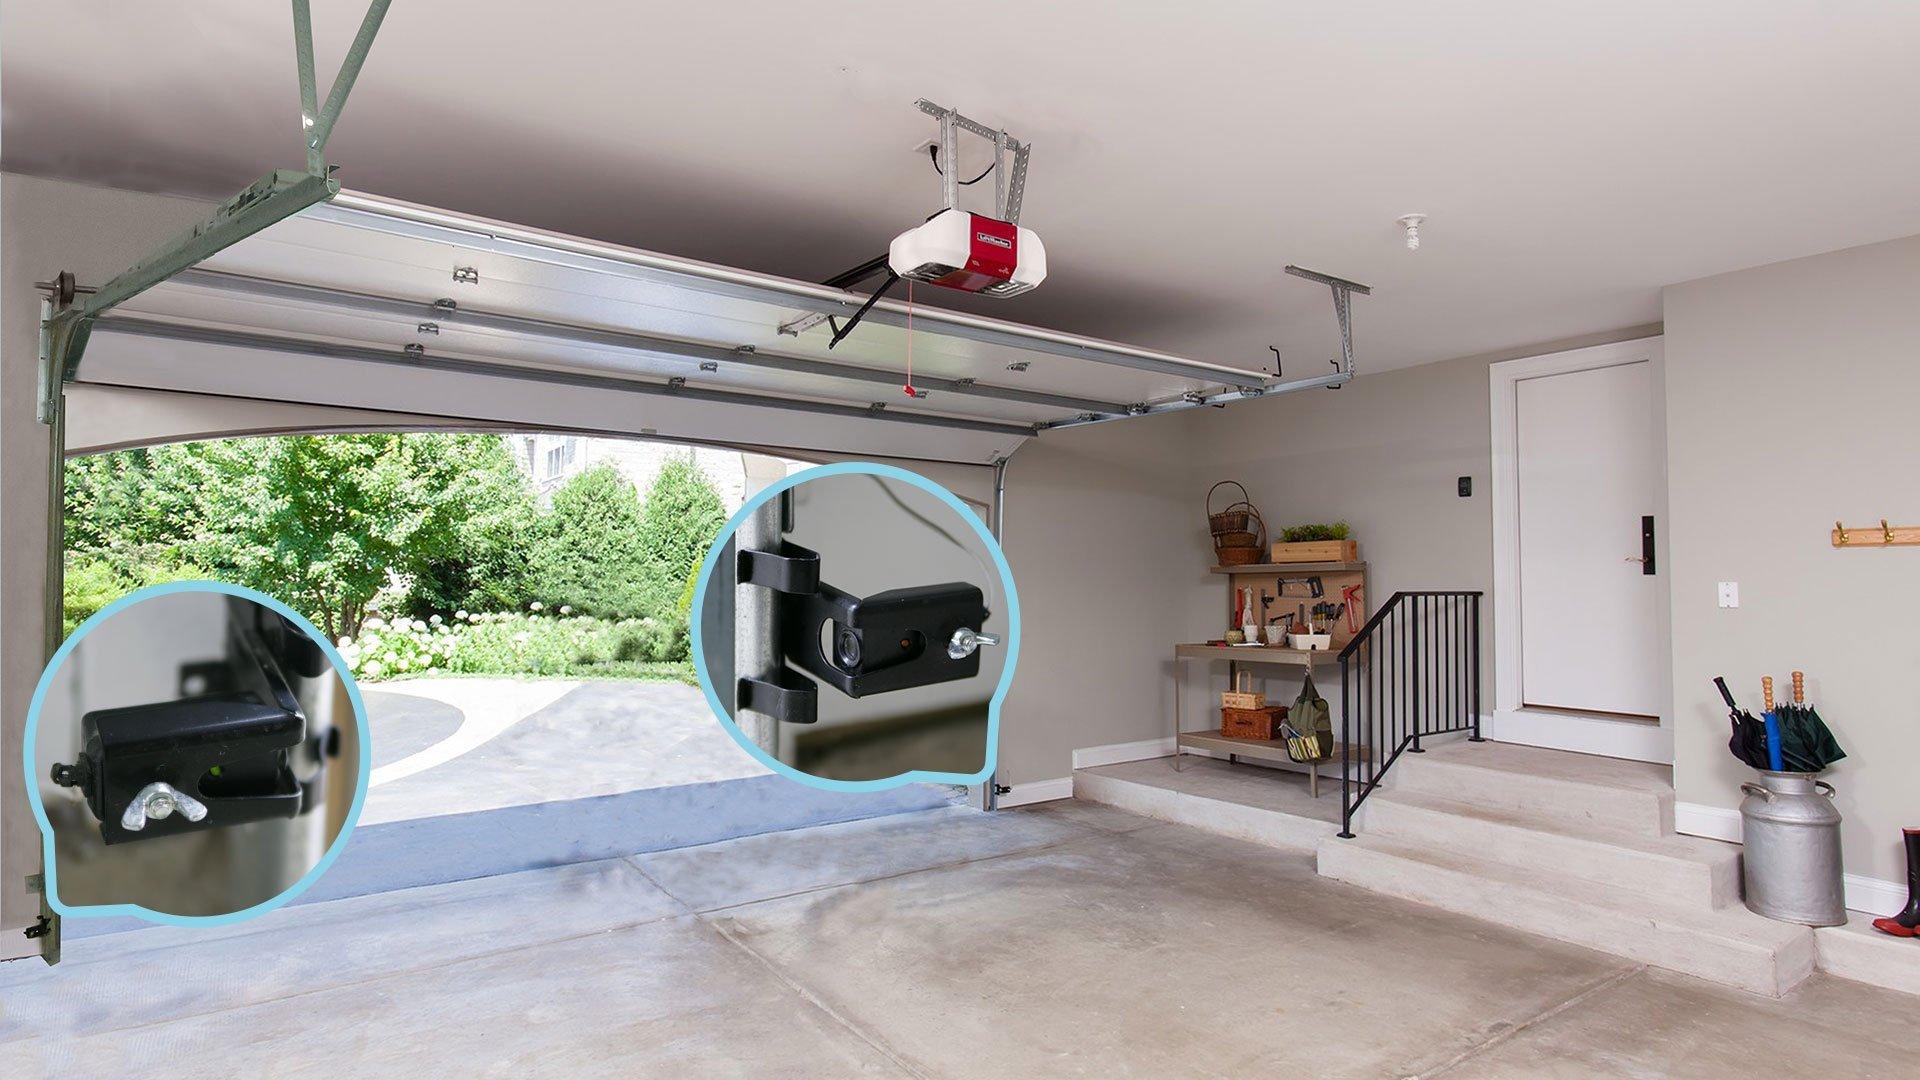 Garage door will not shut and goes back up